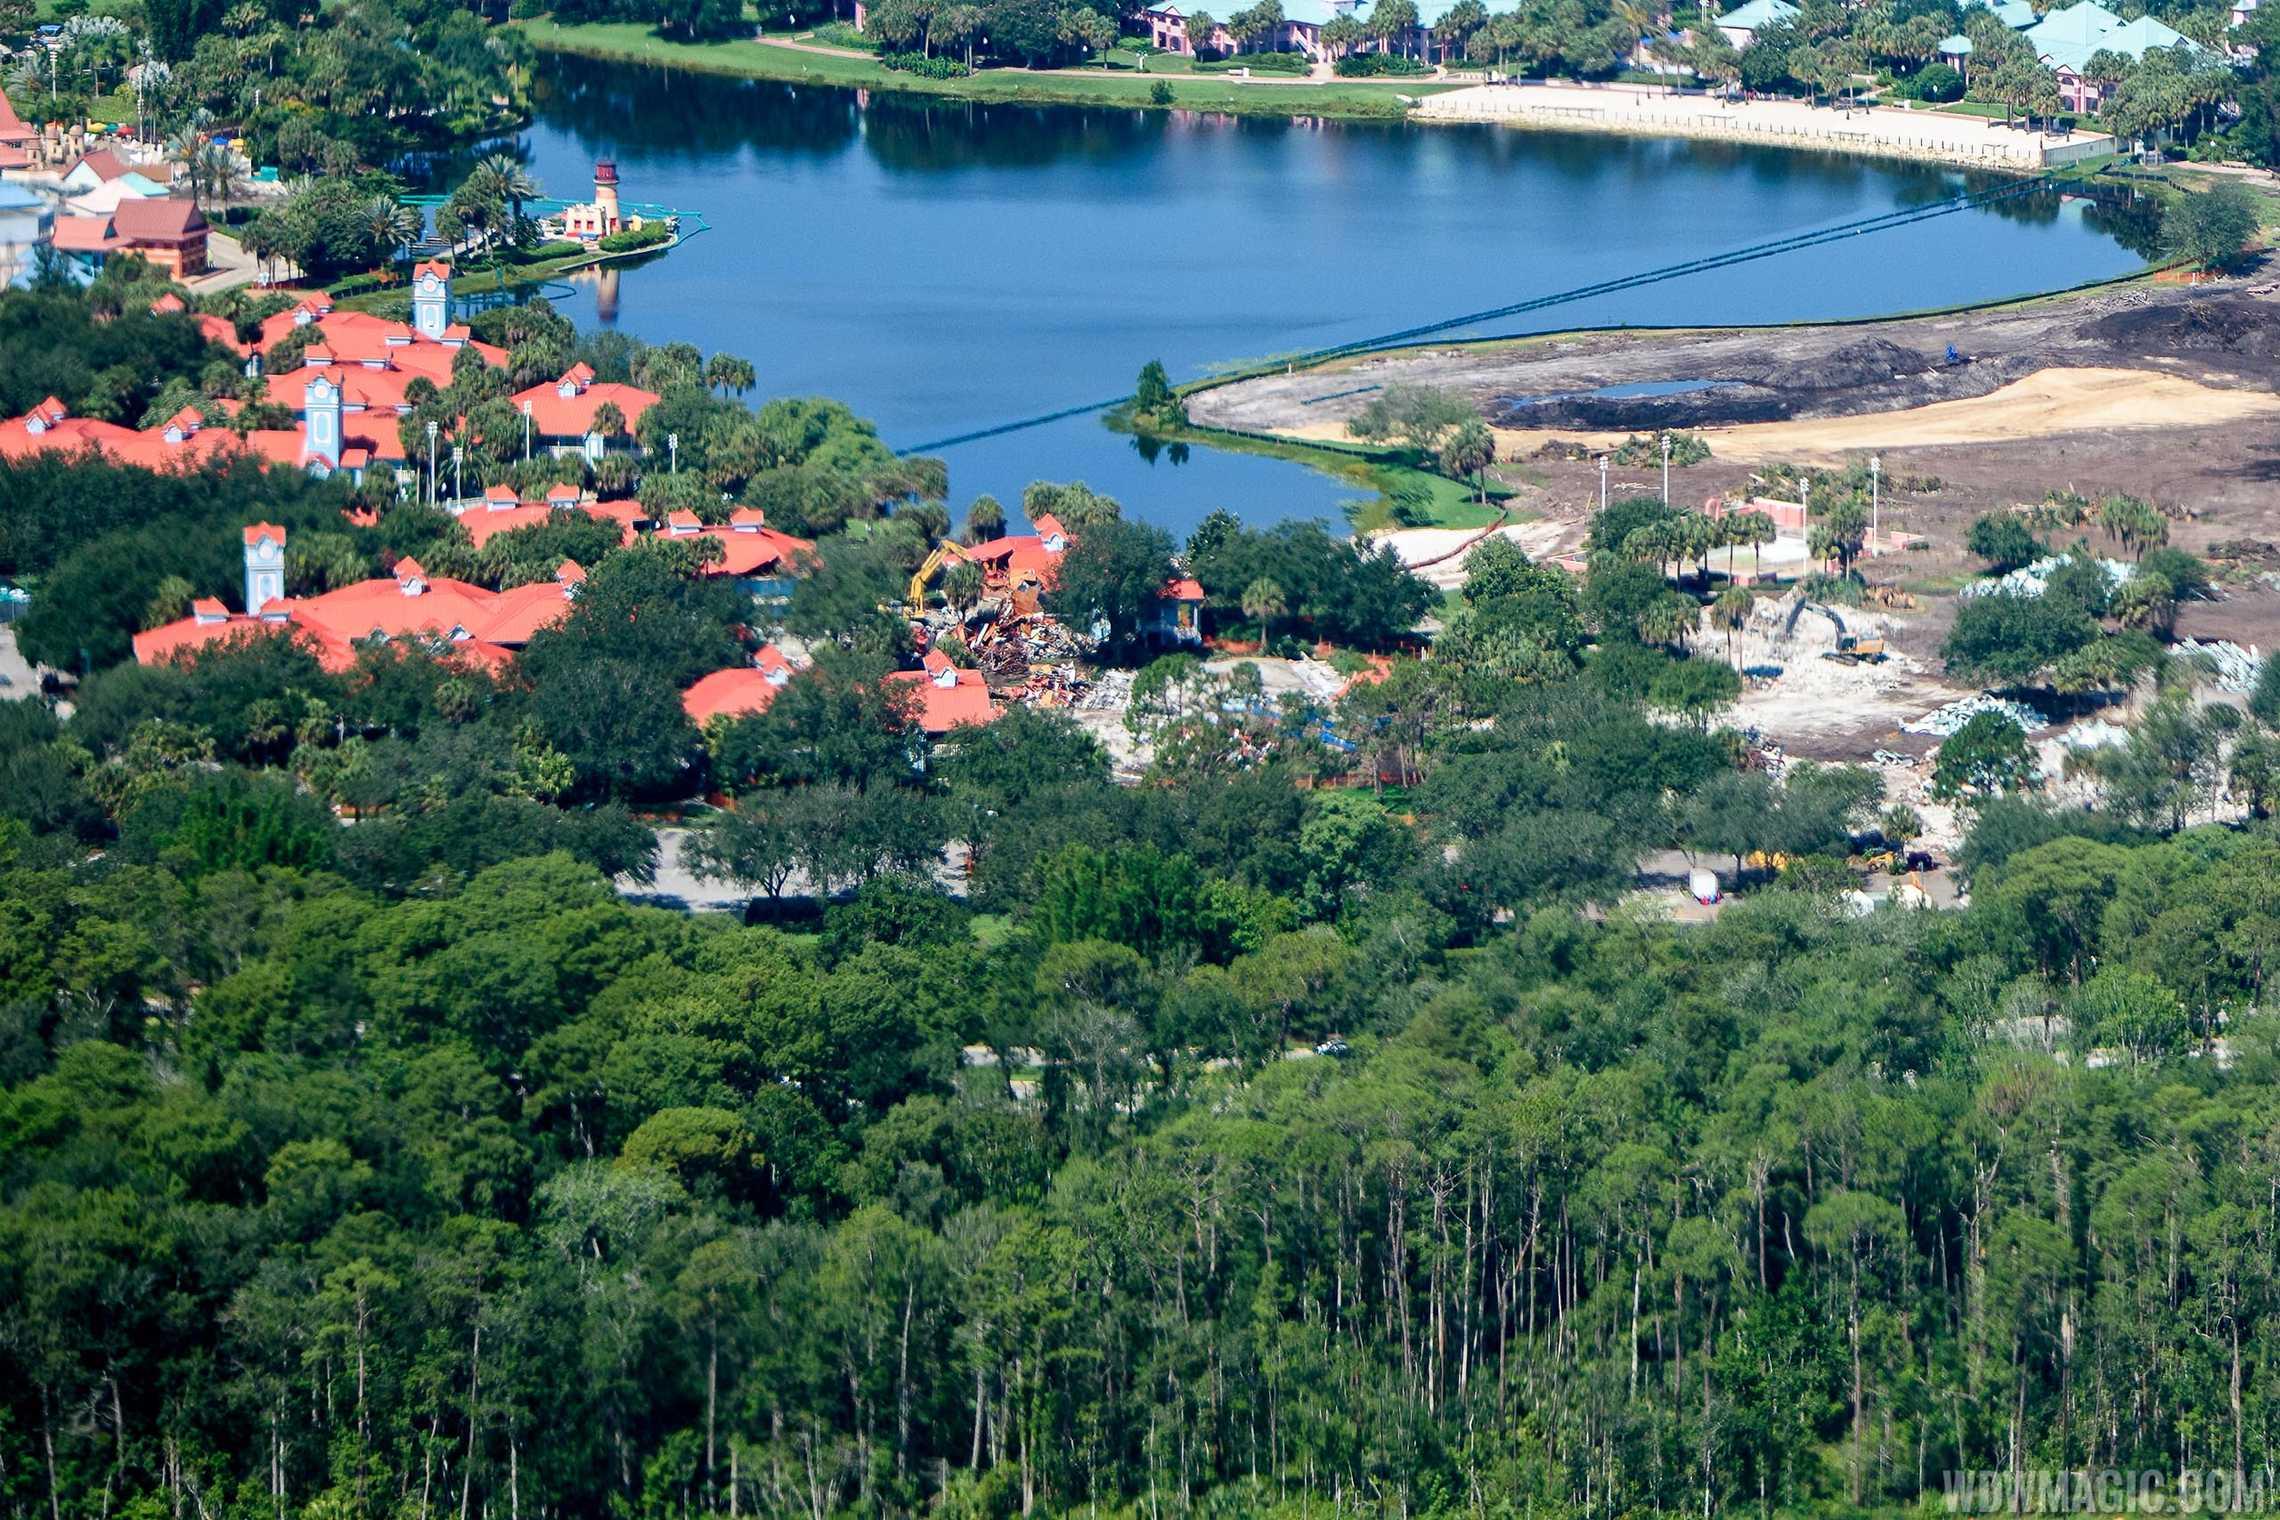 Martinique demolition in progress at Disney's Caribbean Beach Resort